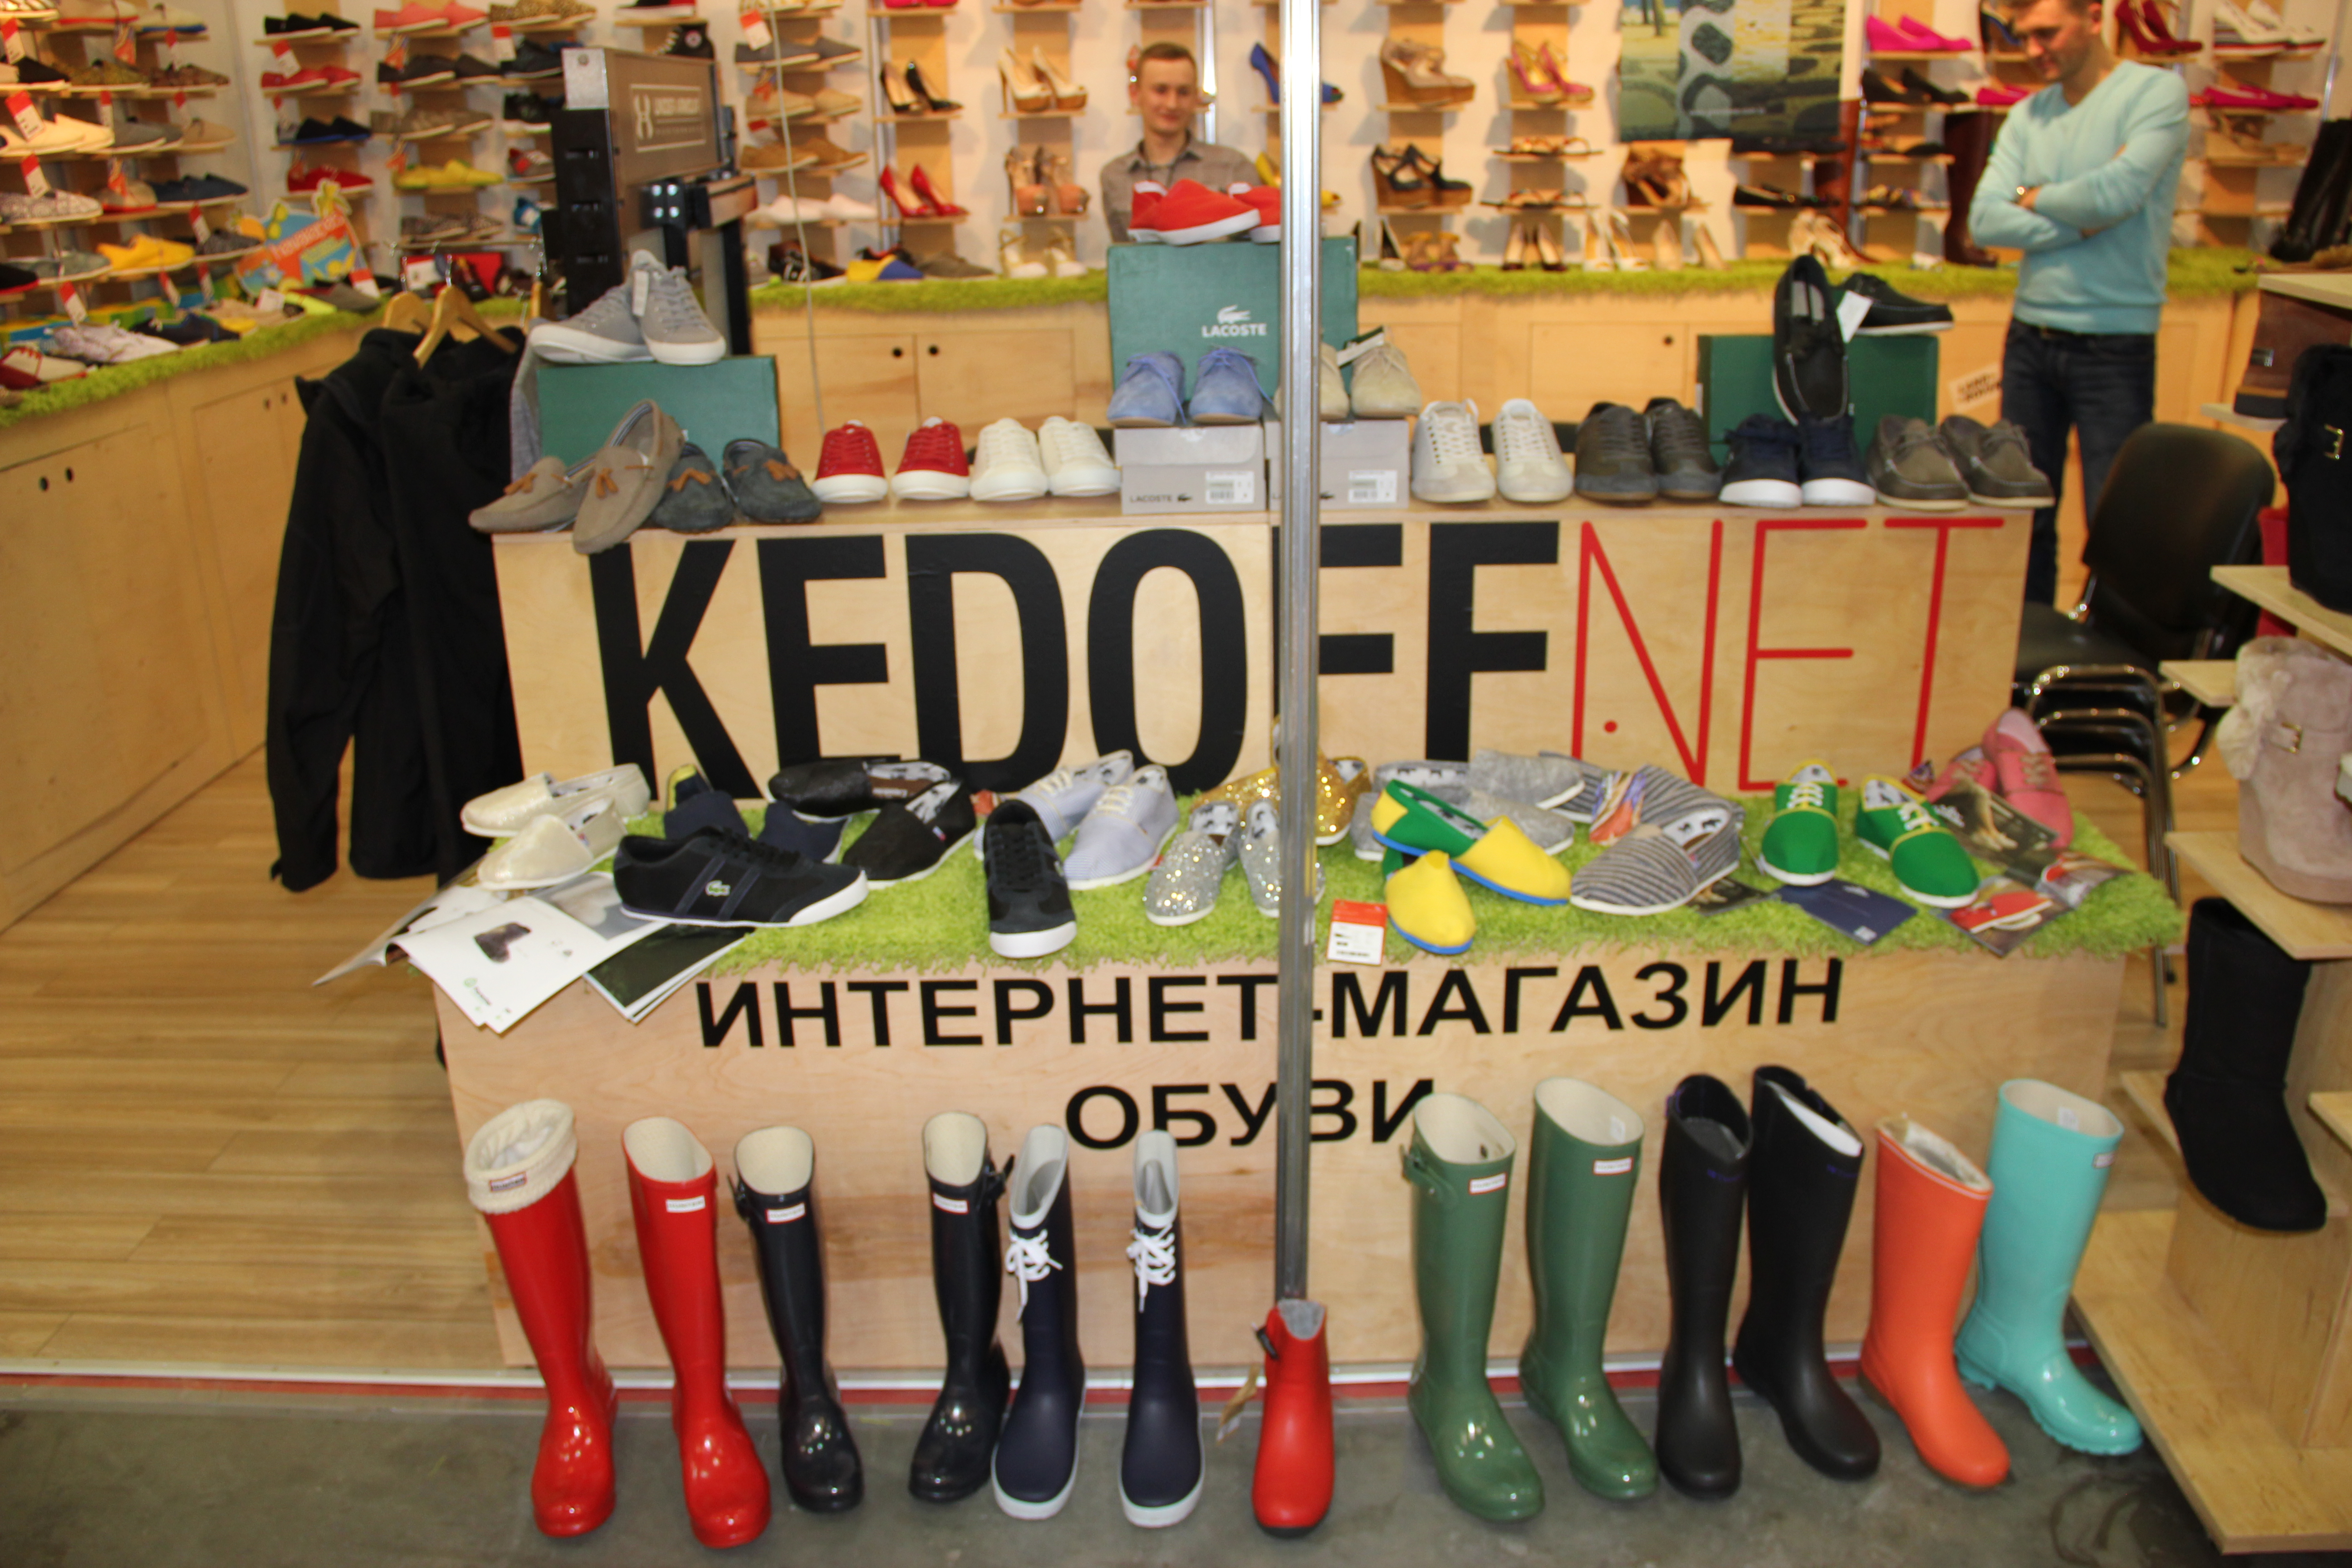 Выставка обуви Leather and Shoes.  Зима 2014-2015